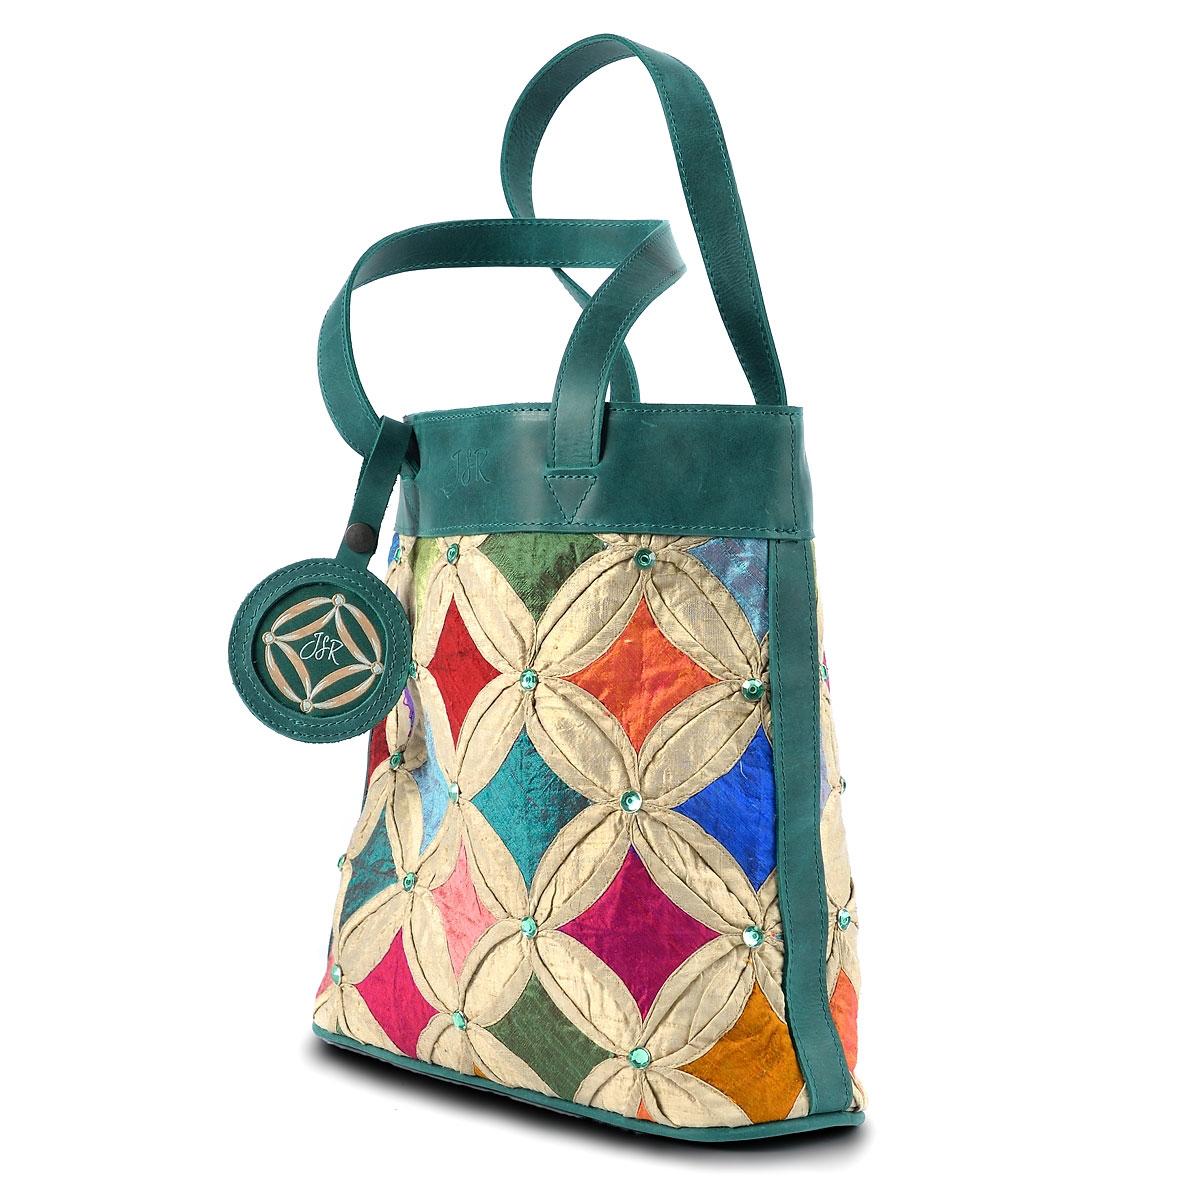 Green Jewel tote bag